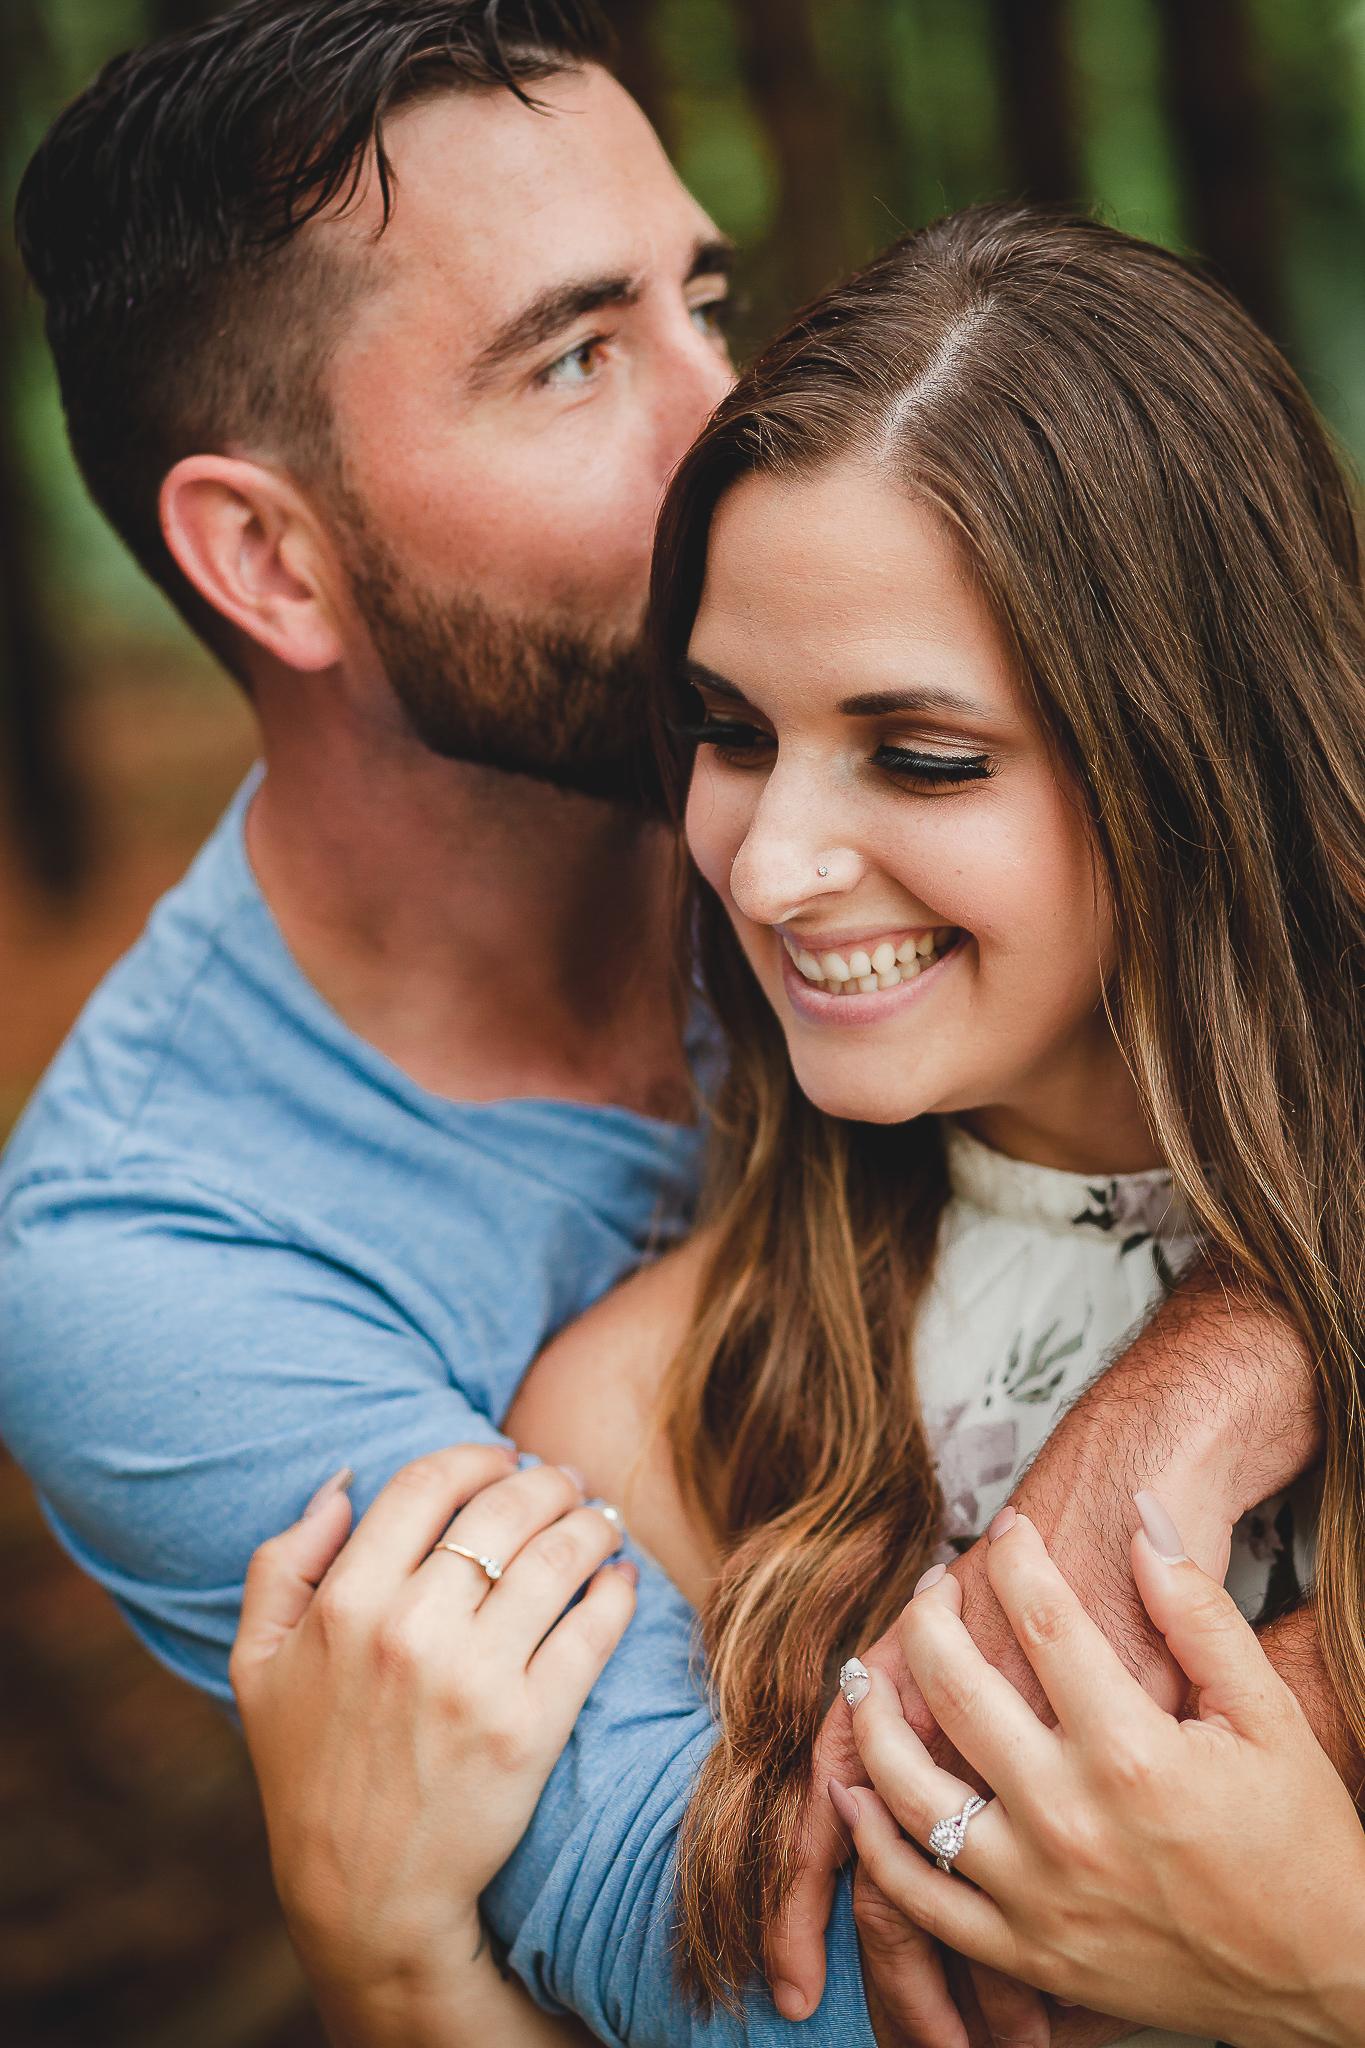 Amy D Photography- Barrie Wedding Photography- Barrie Wedding Photography- Engagement Session- Engagement Photography- Engagement Session Ideas- Wedding Photography-16.jpg